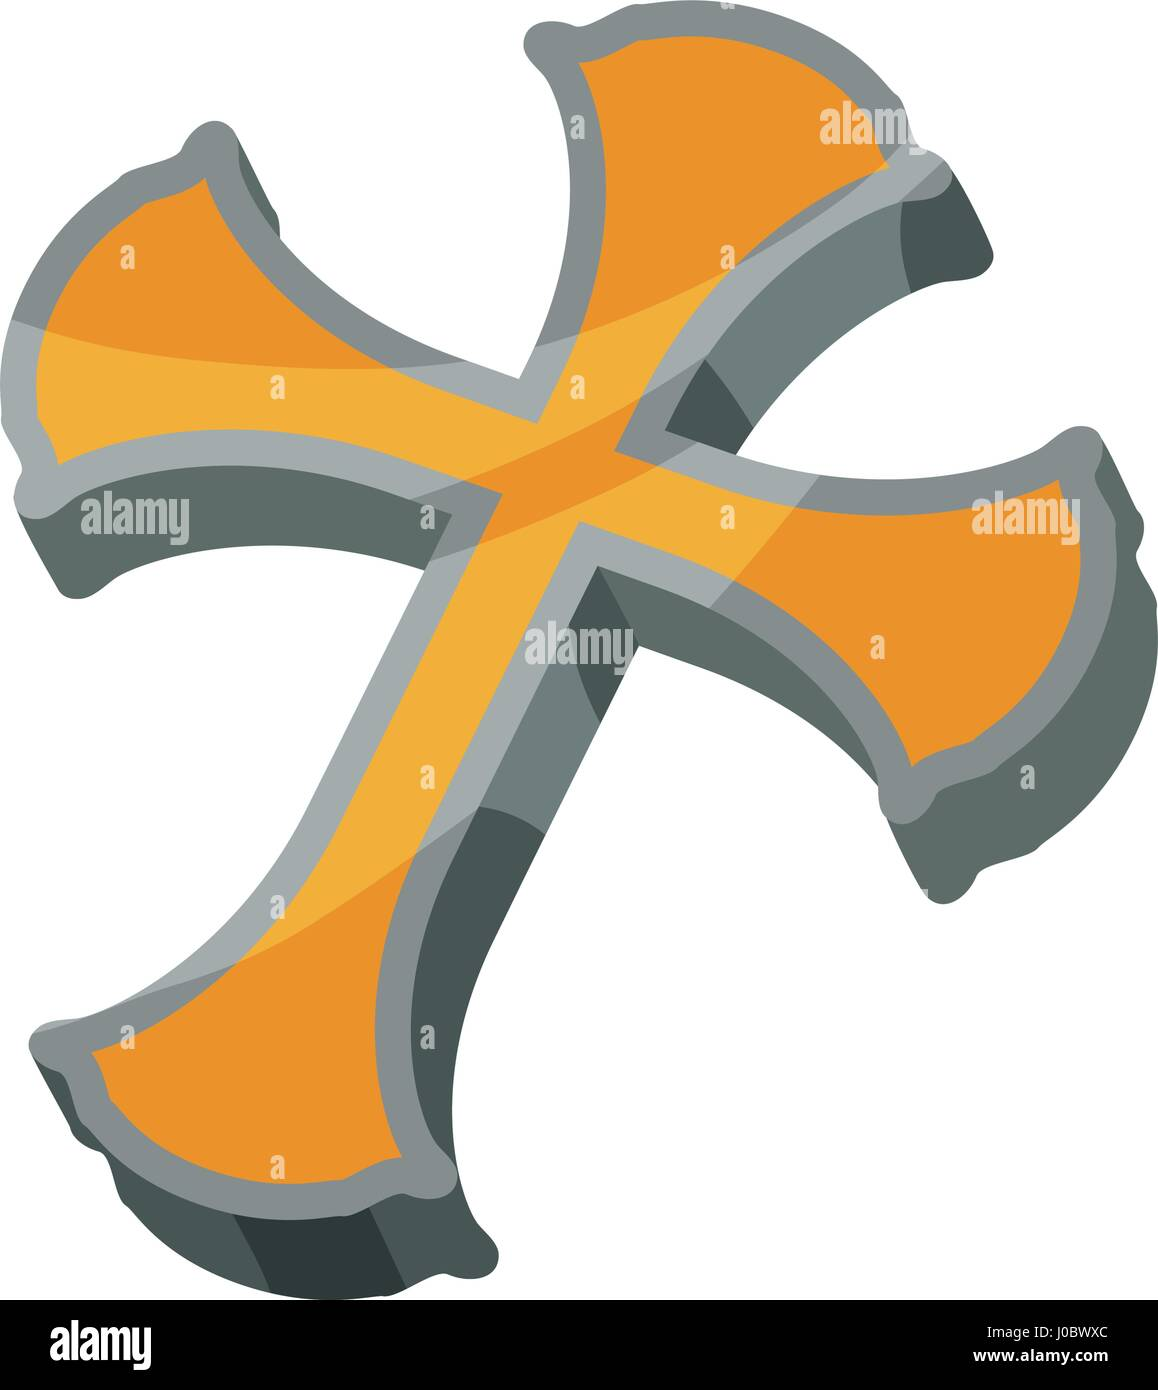 Christianity cross symbol stock vector art illustration vector christianity cross symbol biocorpaavc Gallery